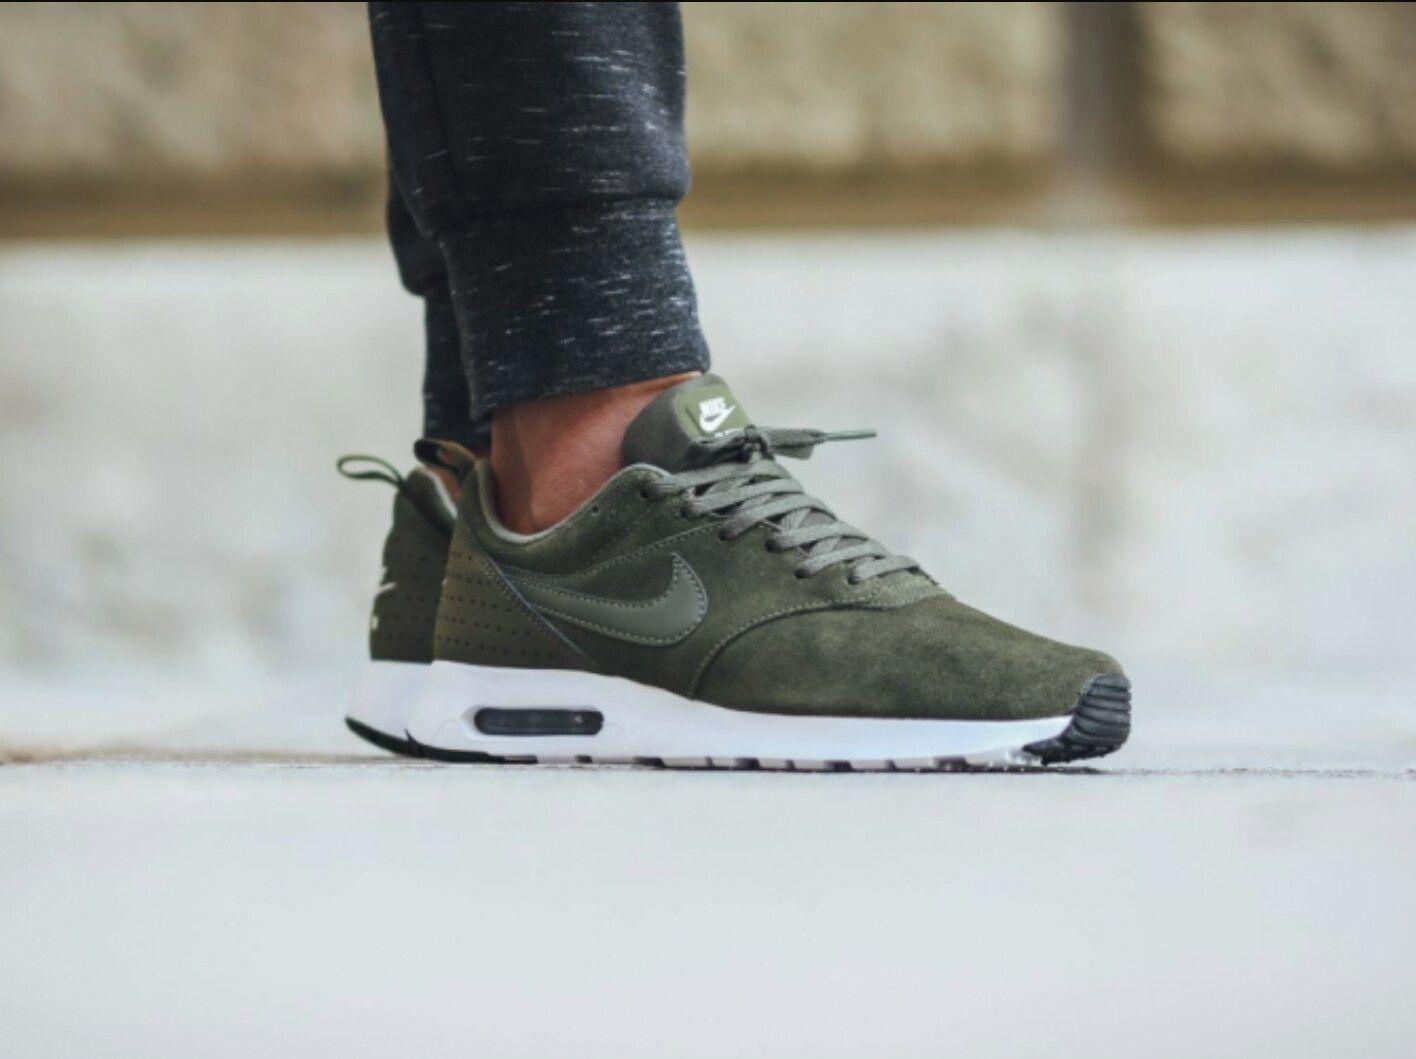 Nike air max tavas cargo green suède | Sneakers nike, Shoes